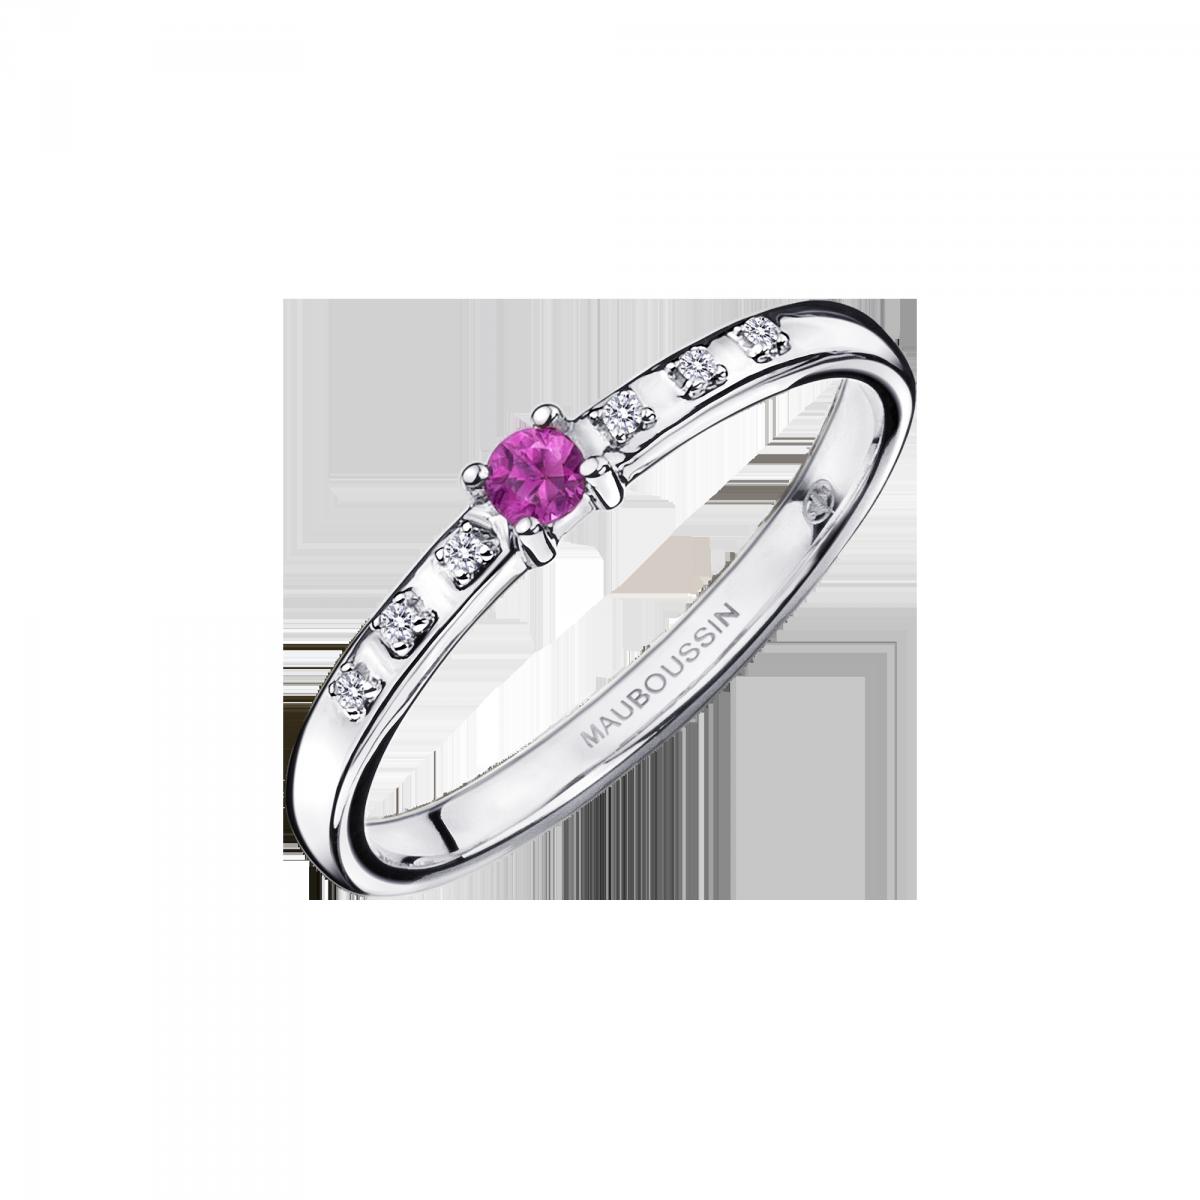 bague-mauboussin-capsule-emotions-saphir-rose-et-diamants-n5